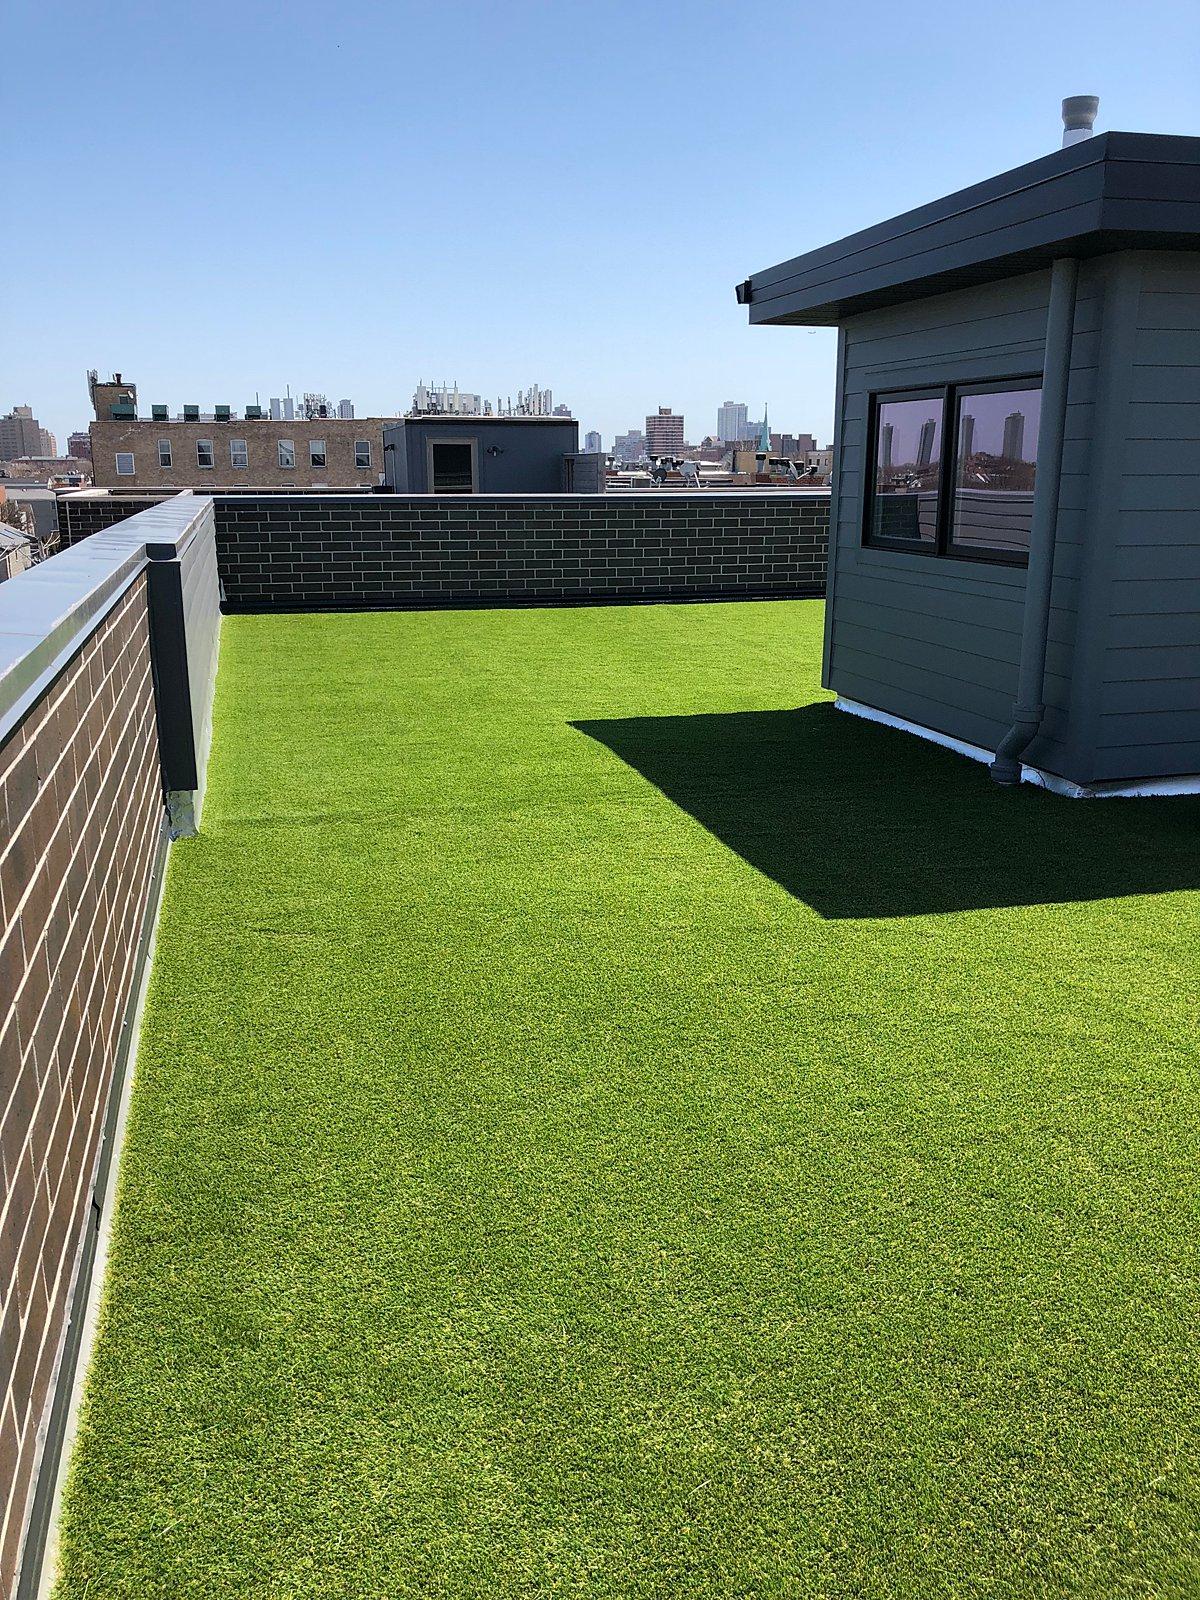 rooftop-lawn-grass-chicago-artificial lawn-turf-turf company-rooftop lawn-rooftop landscape-artificial grass-pet turf-4-min